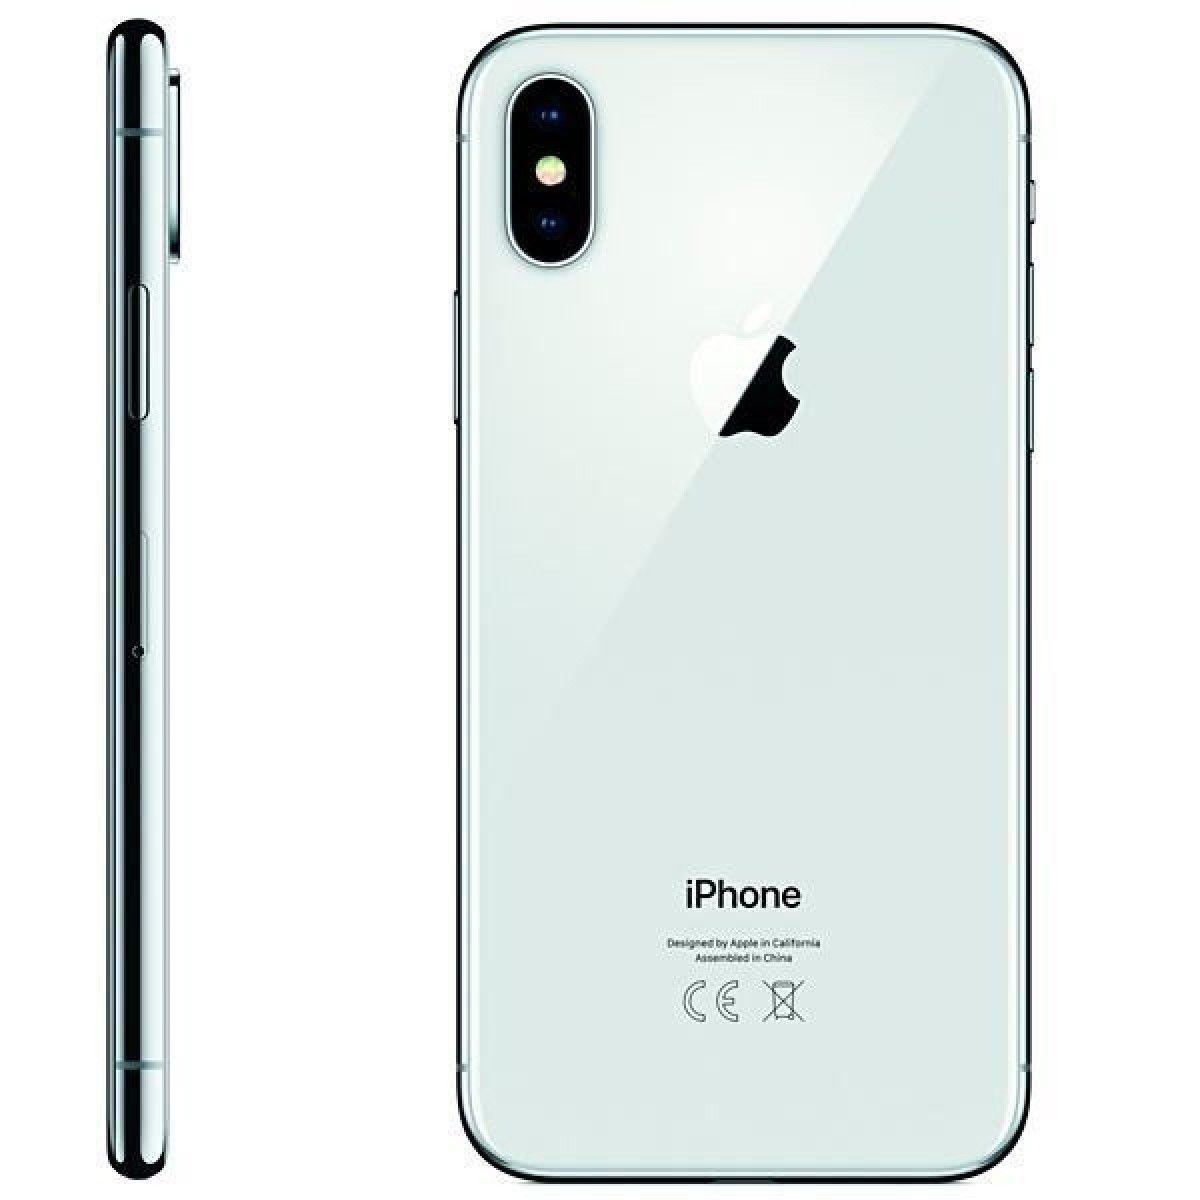 "Apple iPhone X - 256GB, Tela Super Retina de 5.8"", Face ID, Câmera Dupla de 12MP, Recarga sem fio - Prata"